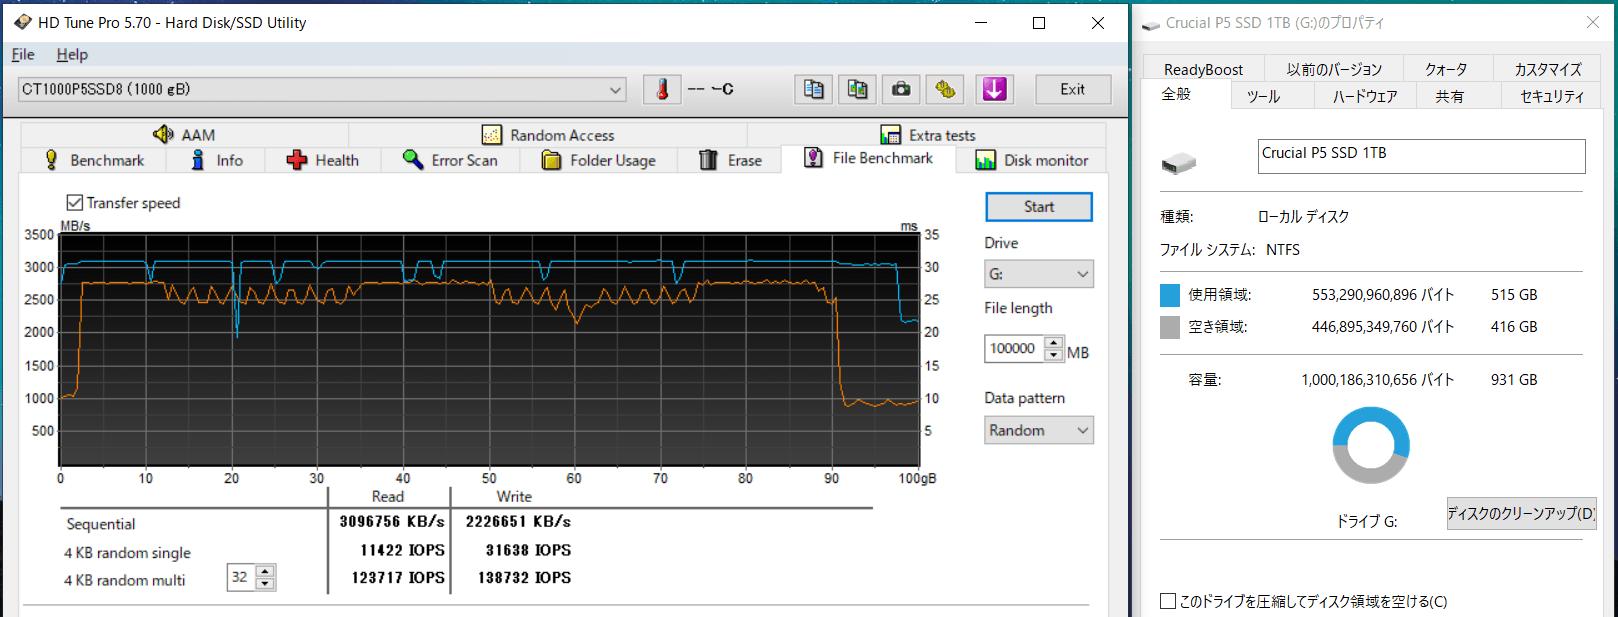 Crucial P5 SSD 1TB_HDT_50-Fill